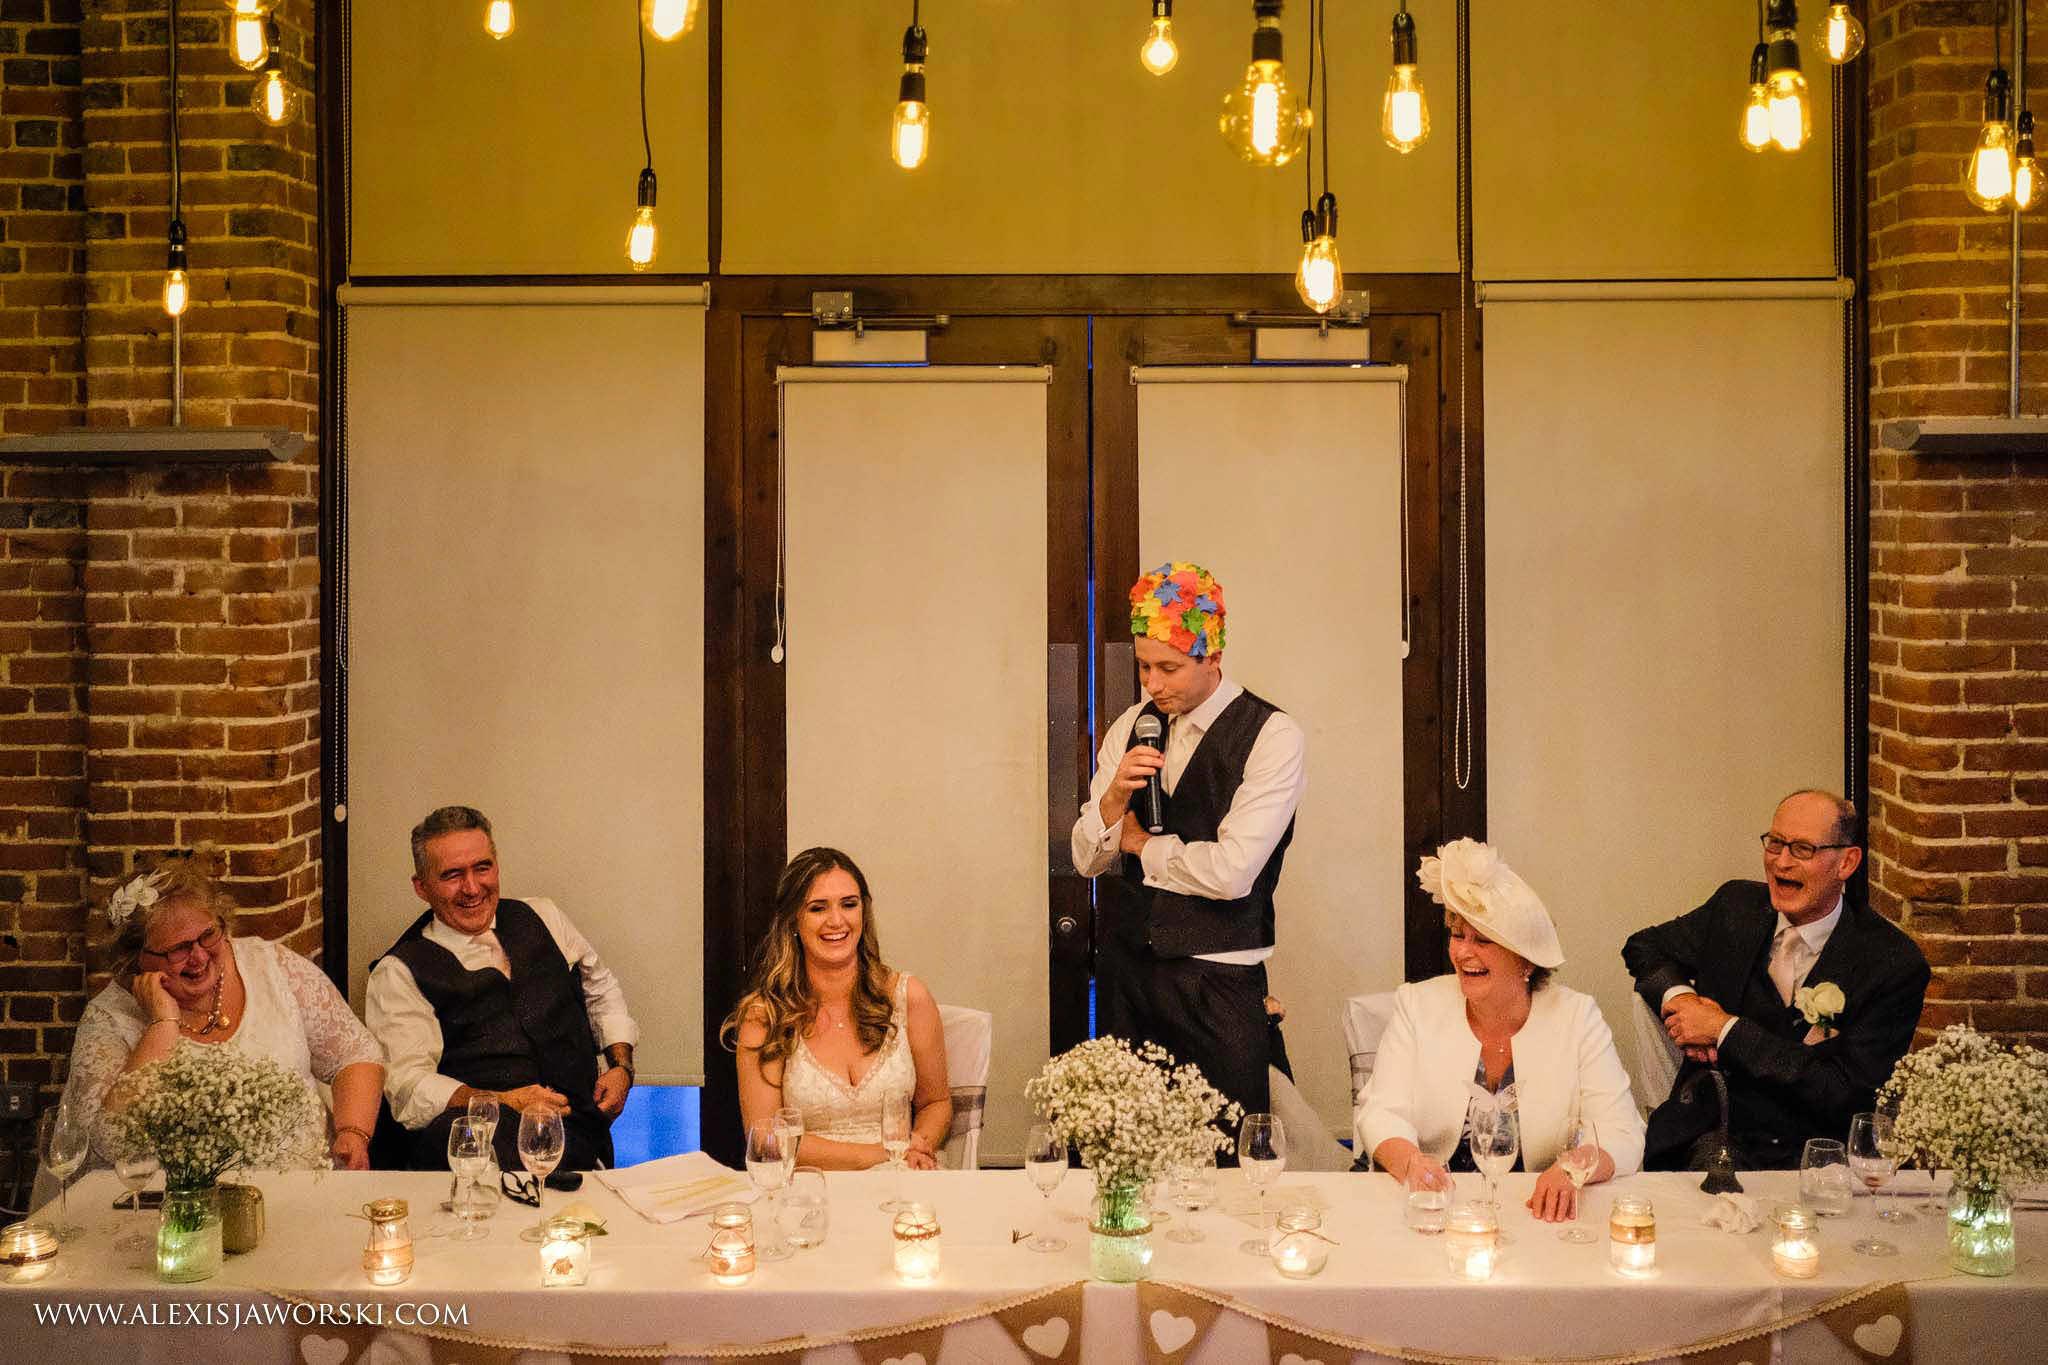 The groom's speech!